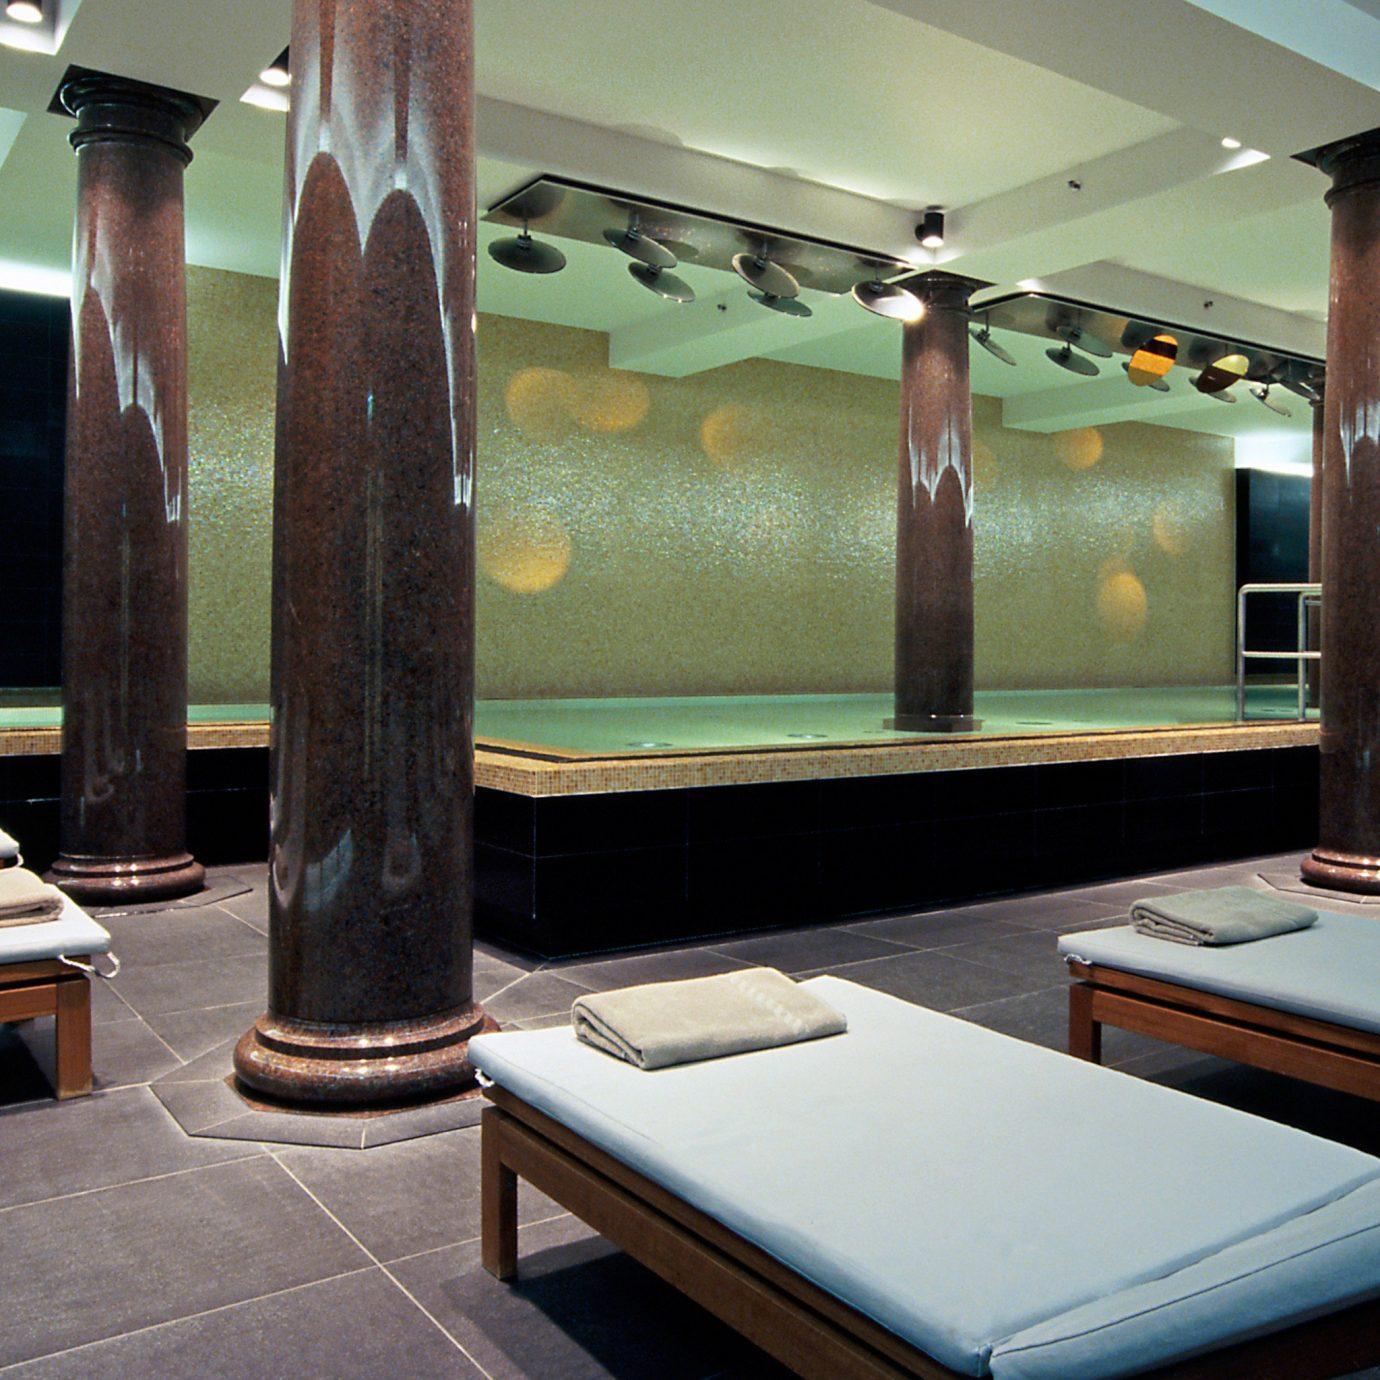 Pool Spa sport venue Lobby recreation room Suite living room